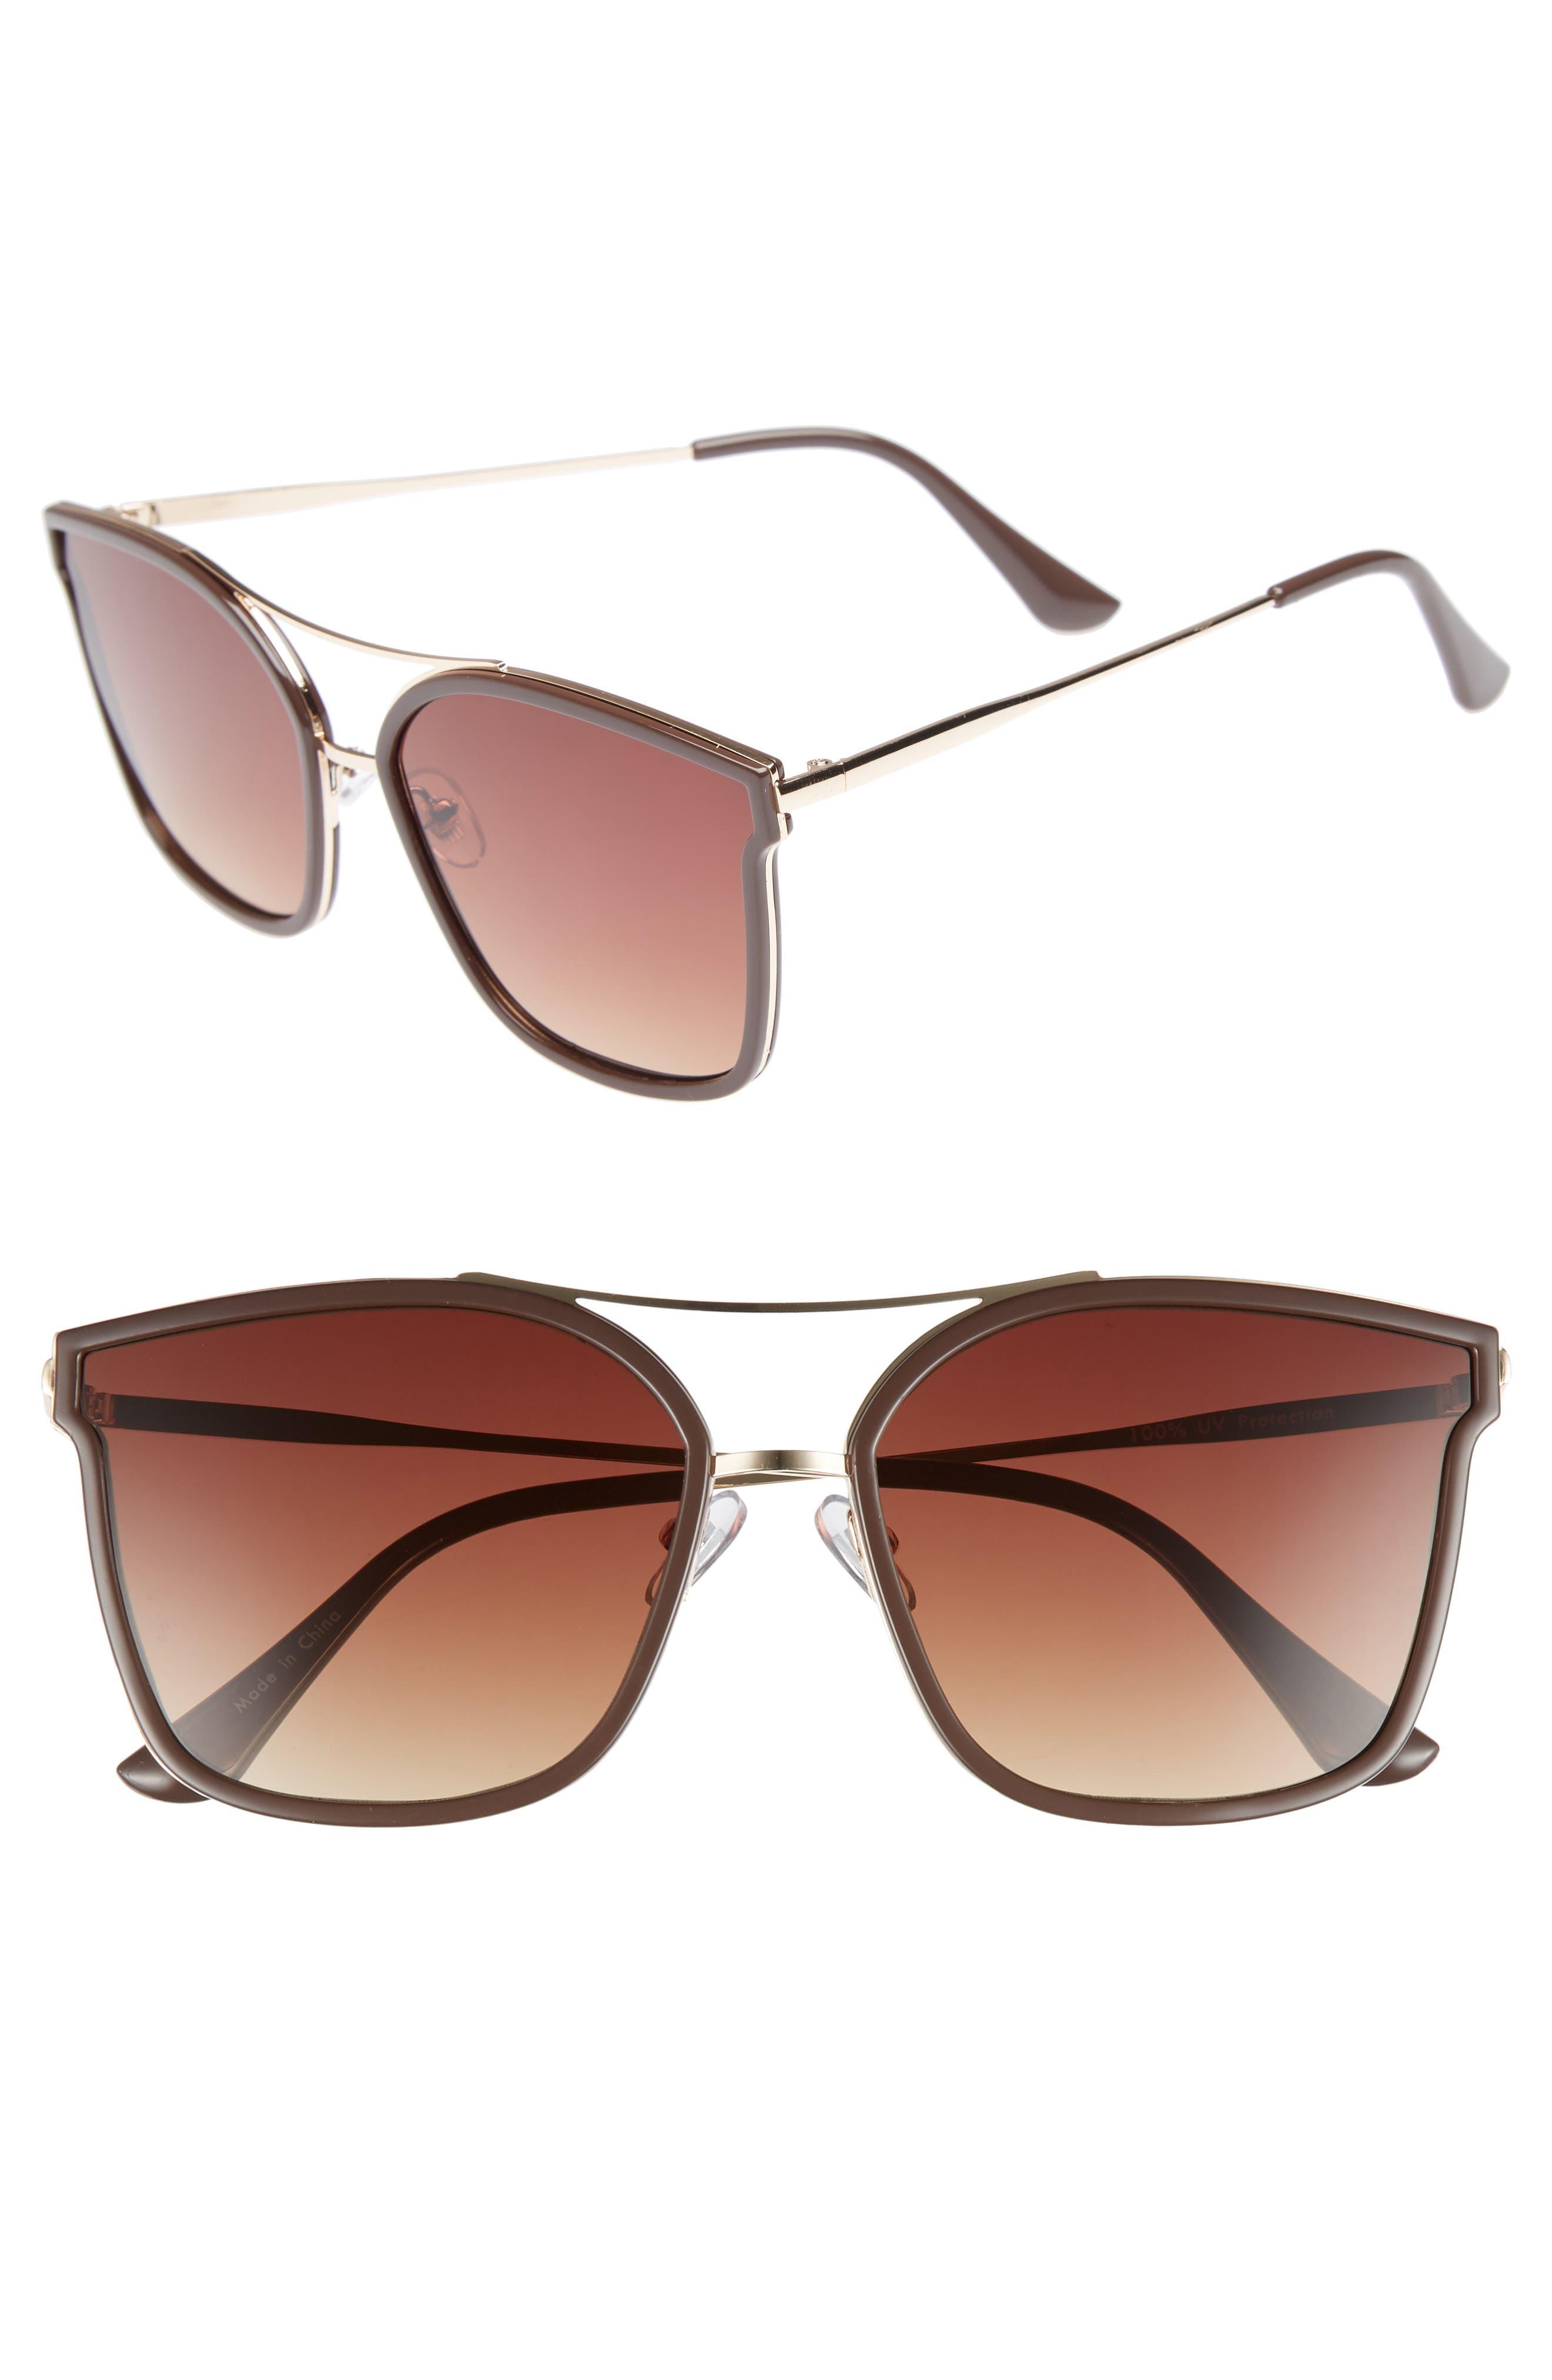 60mm Cat Eye Sunglasses,                         Main,                         color, 710